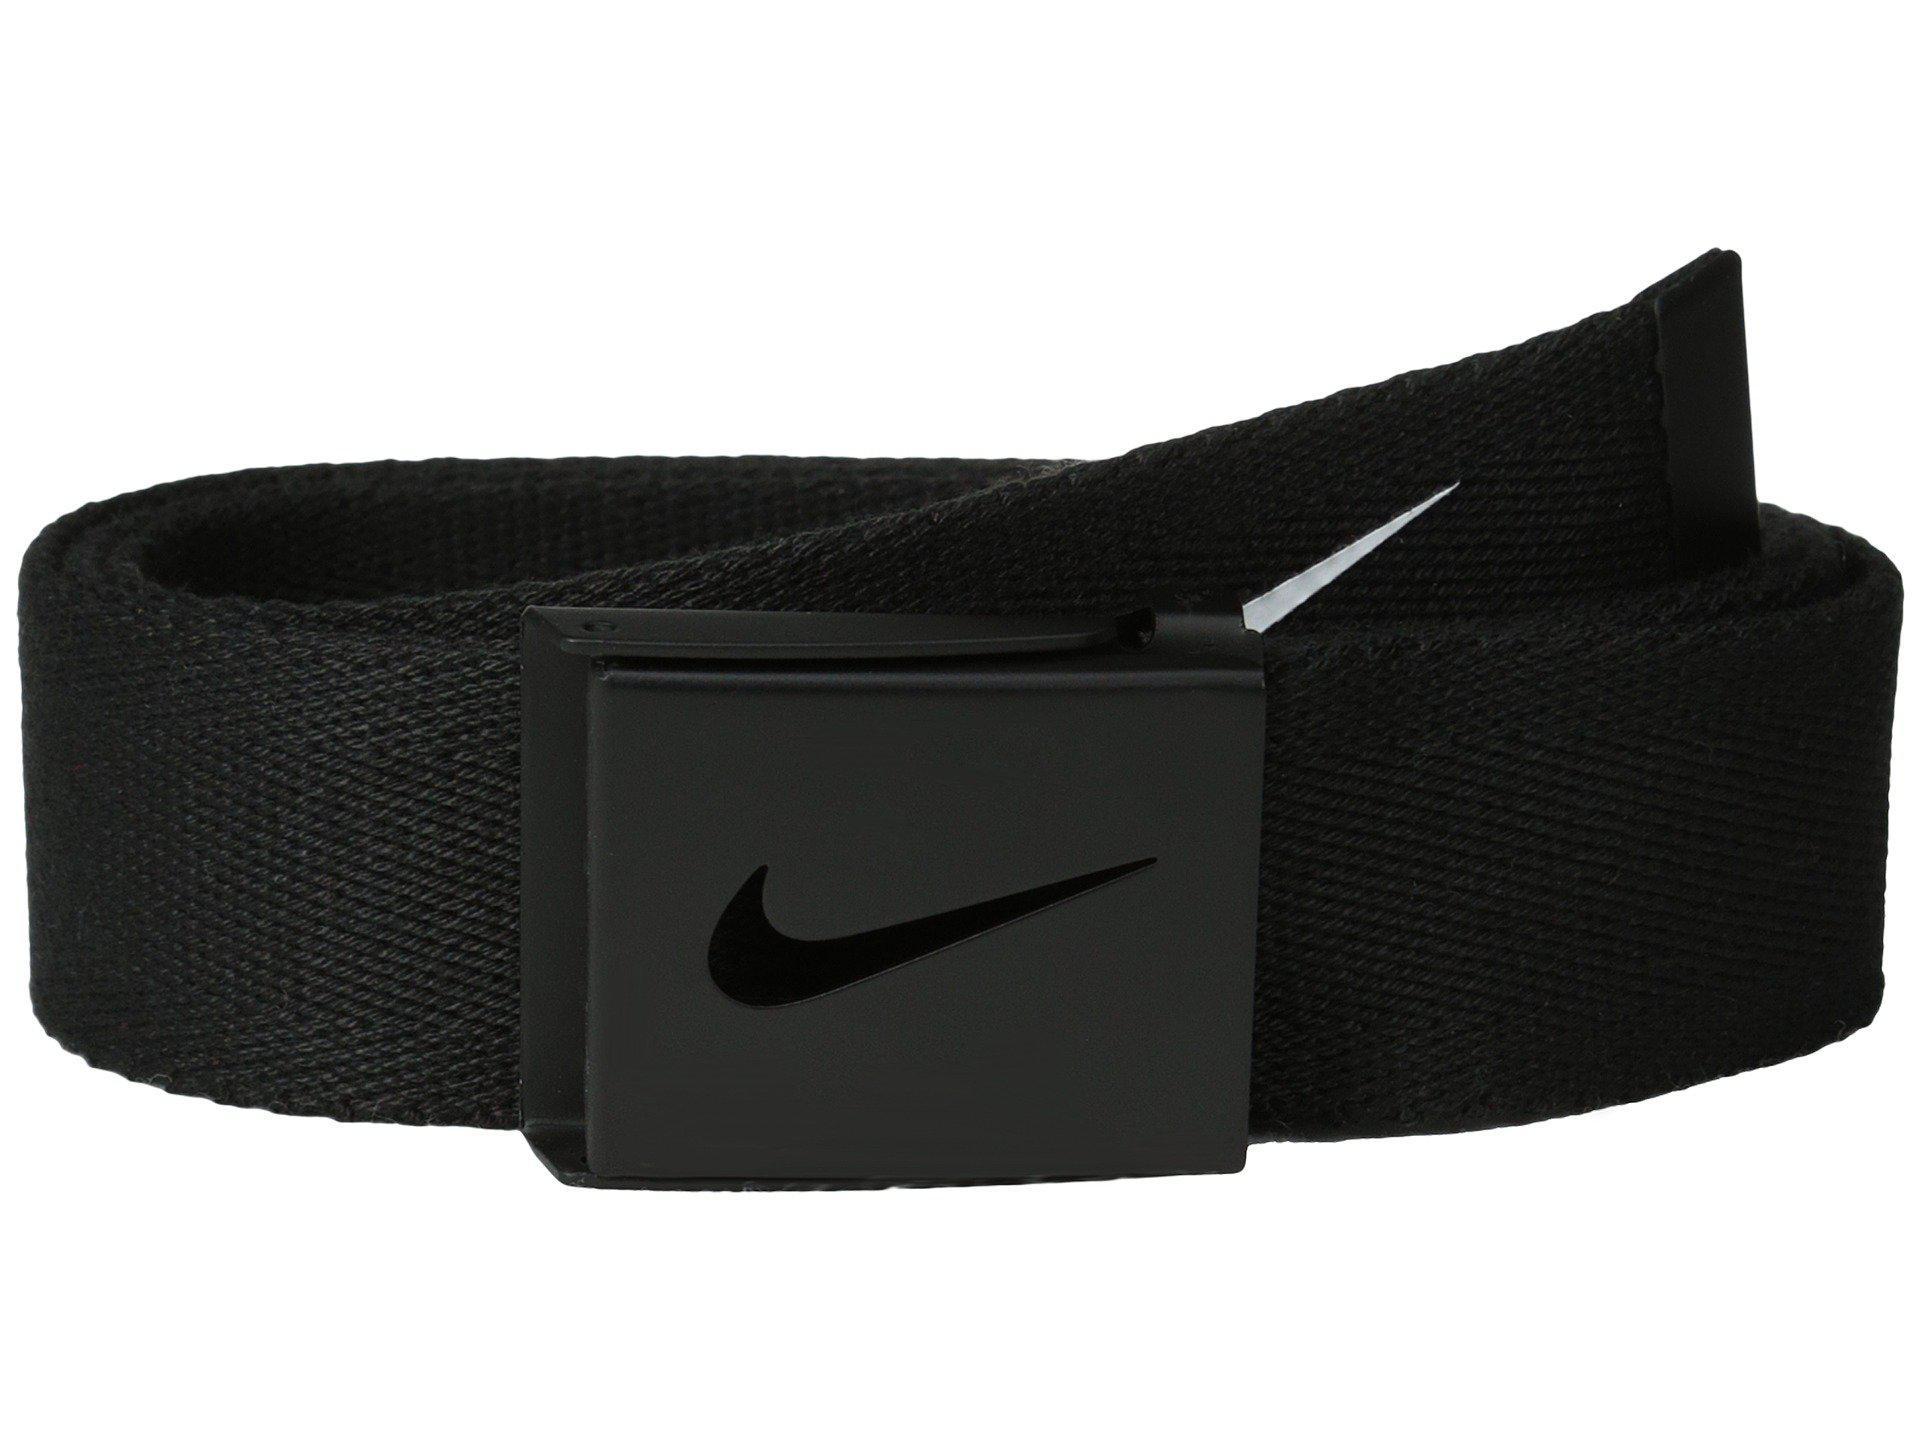 4e22a700e4 Nike Tech Essentials Single Web (white) Belts in Black - Lyst